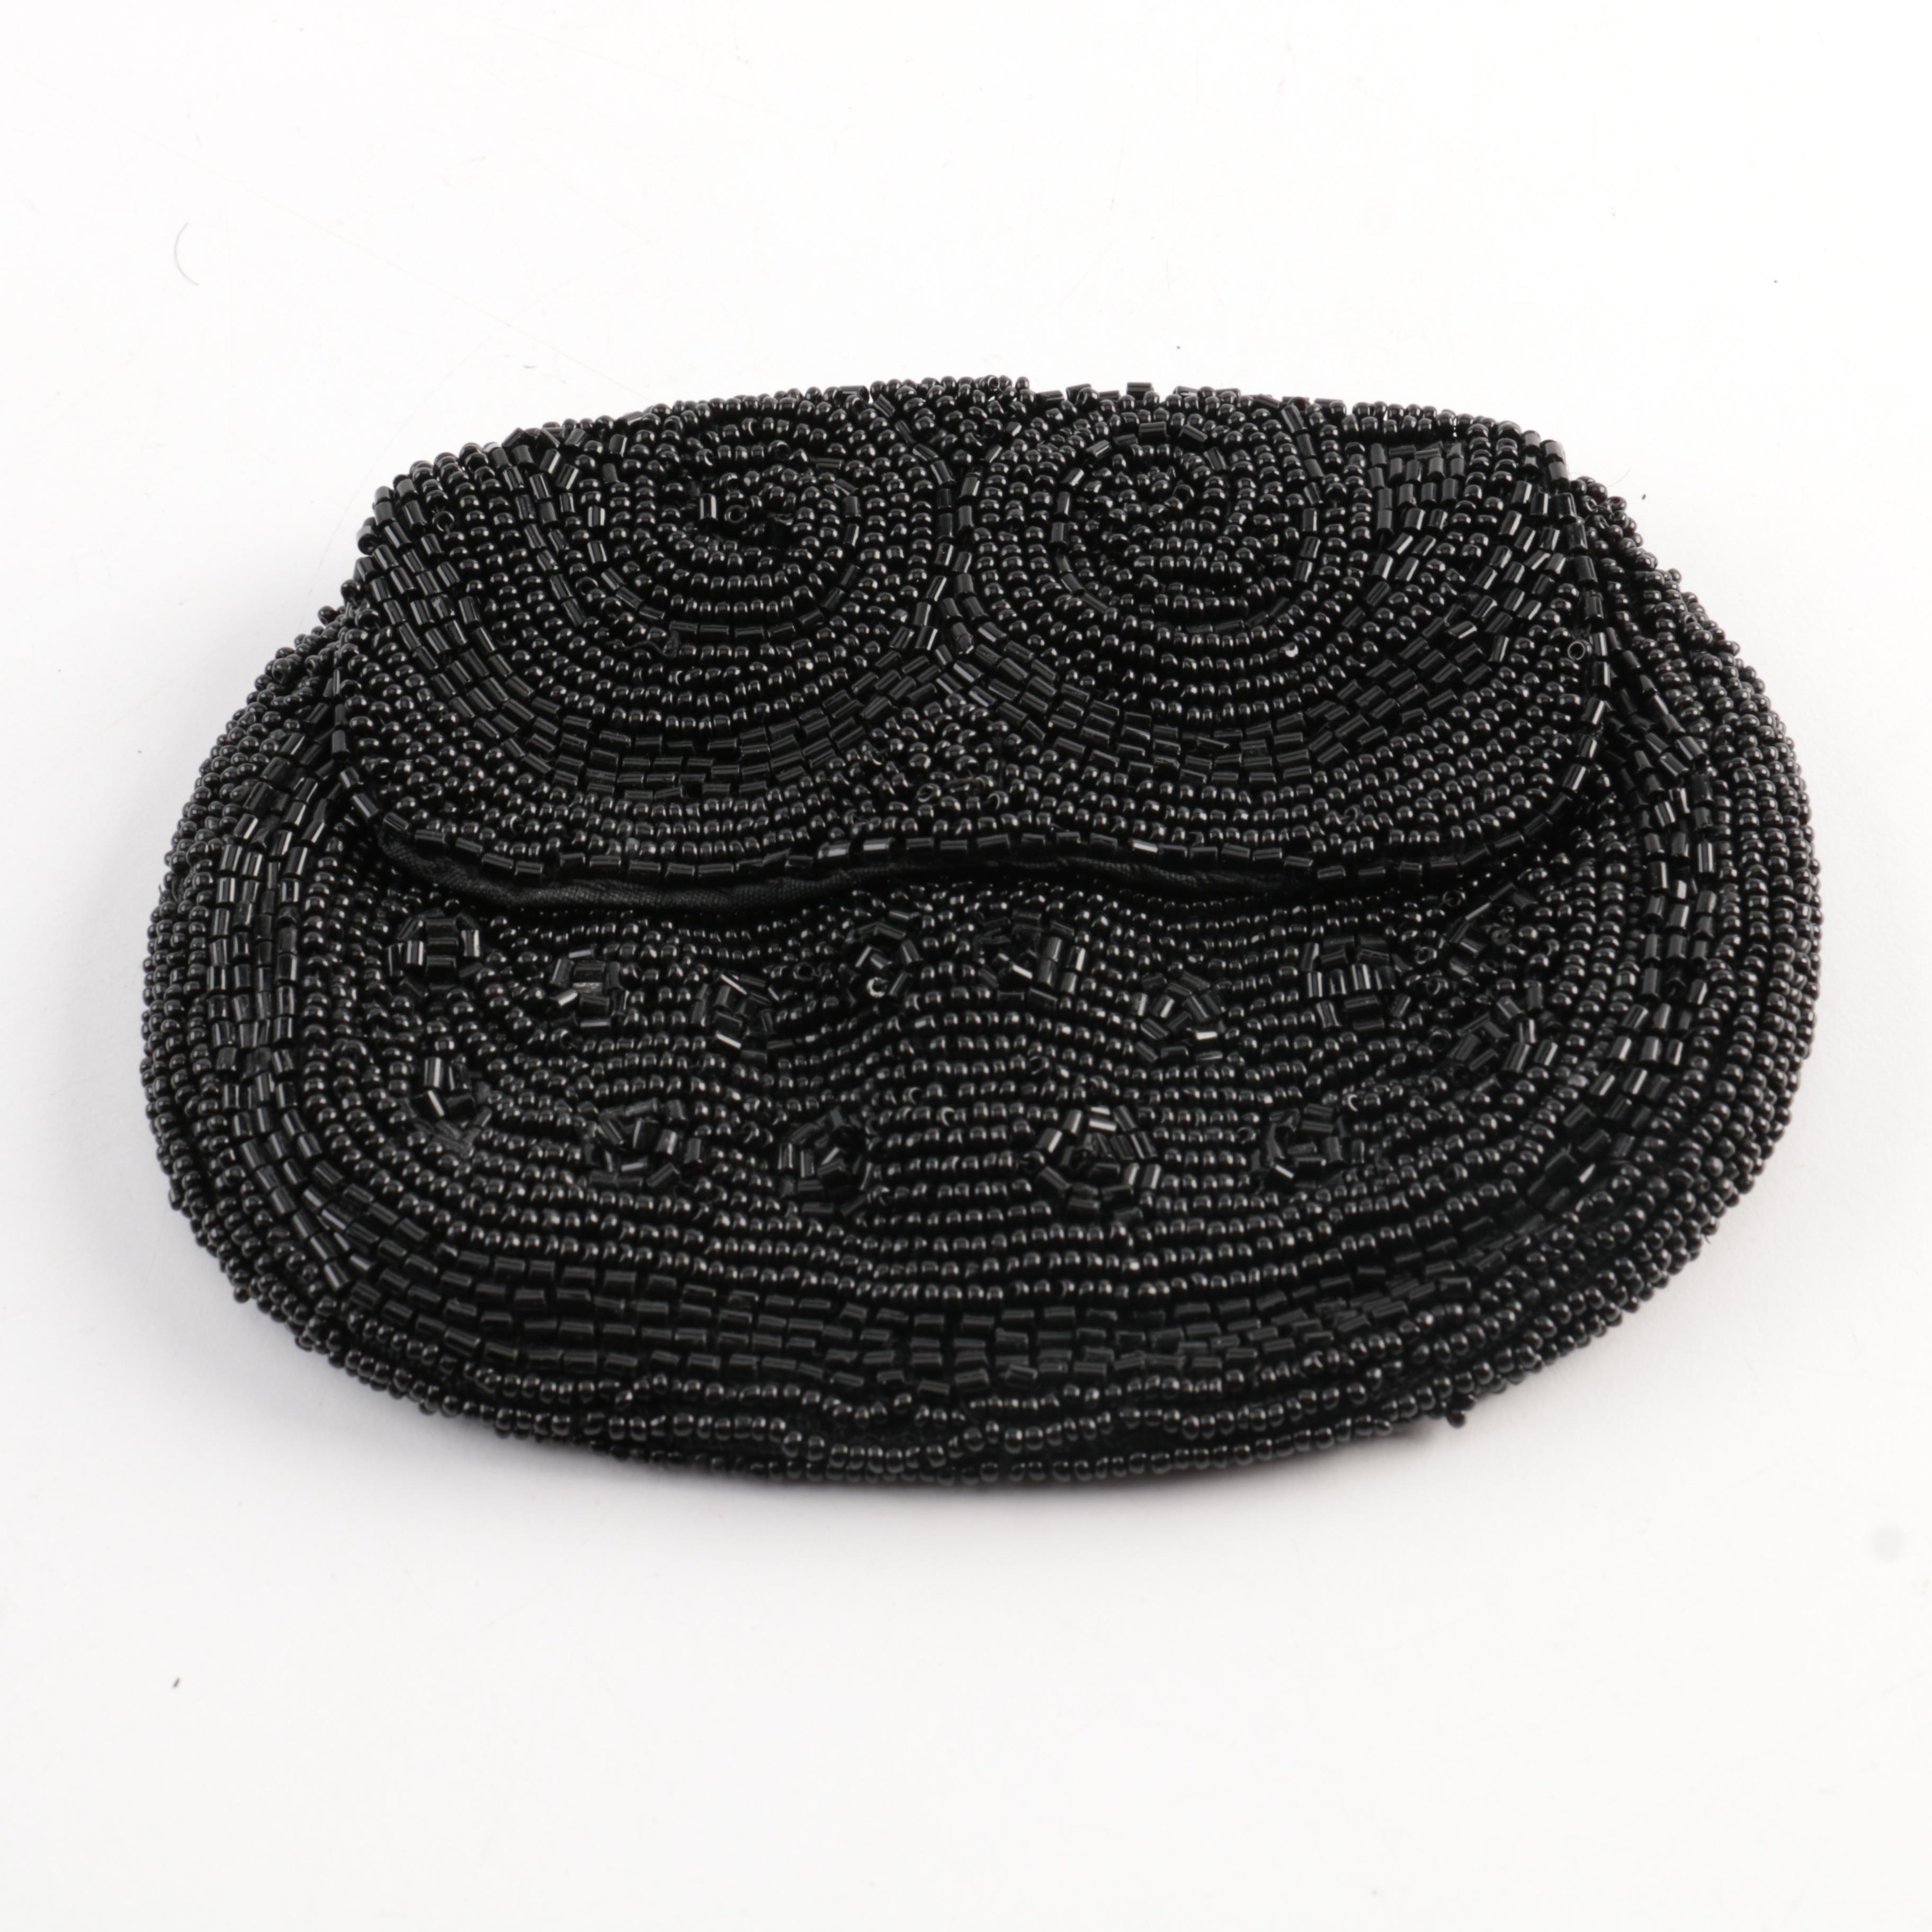 Black Beaded Belt Pouch